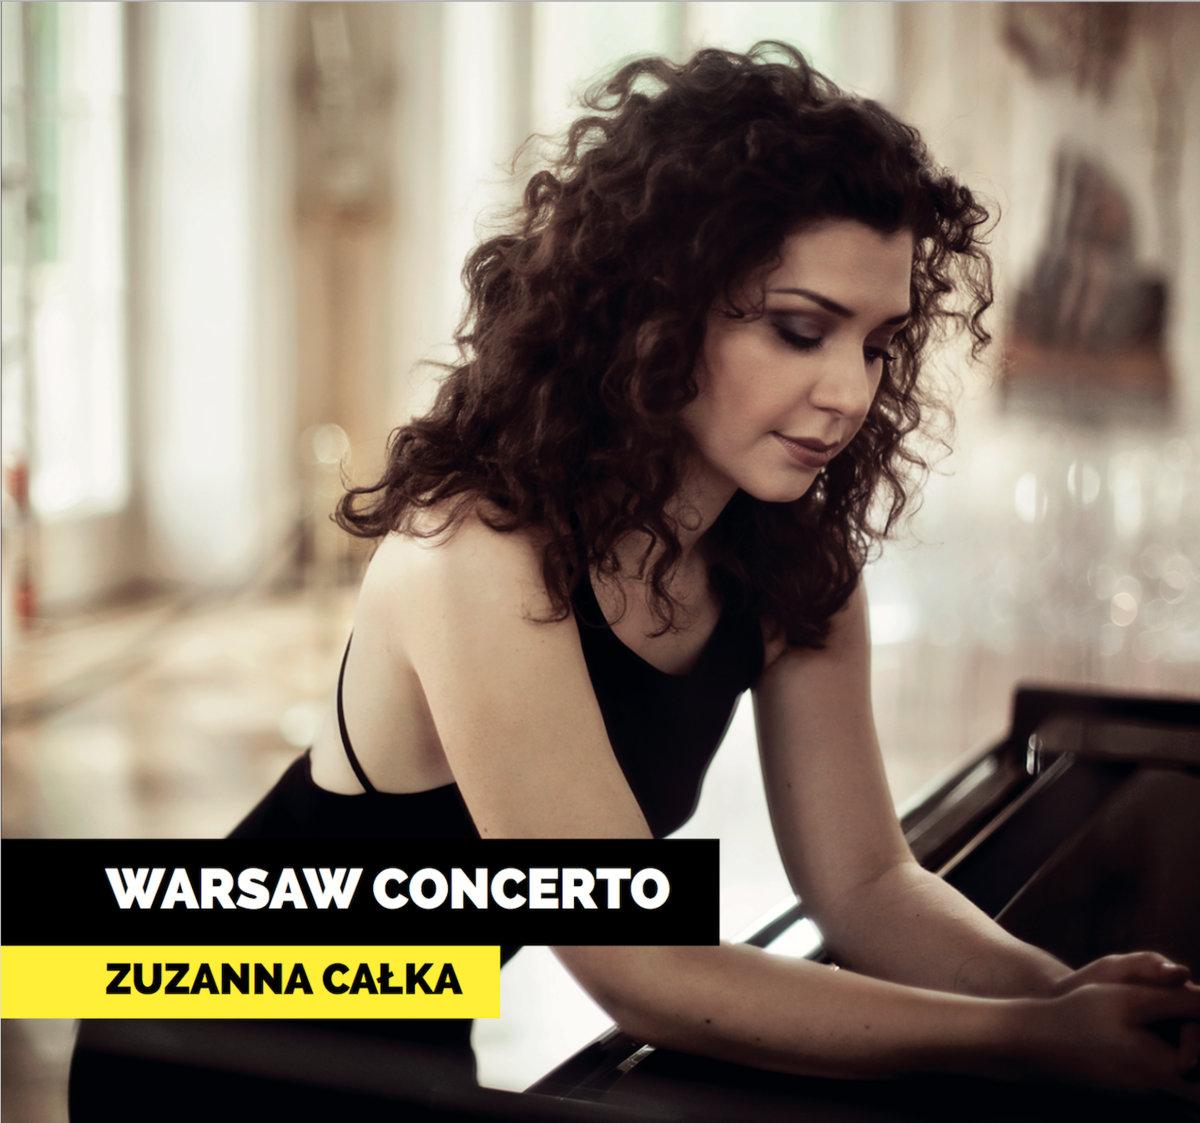 Warsaw Concerto | Zuzanna Całka